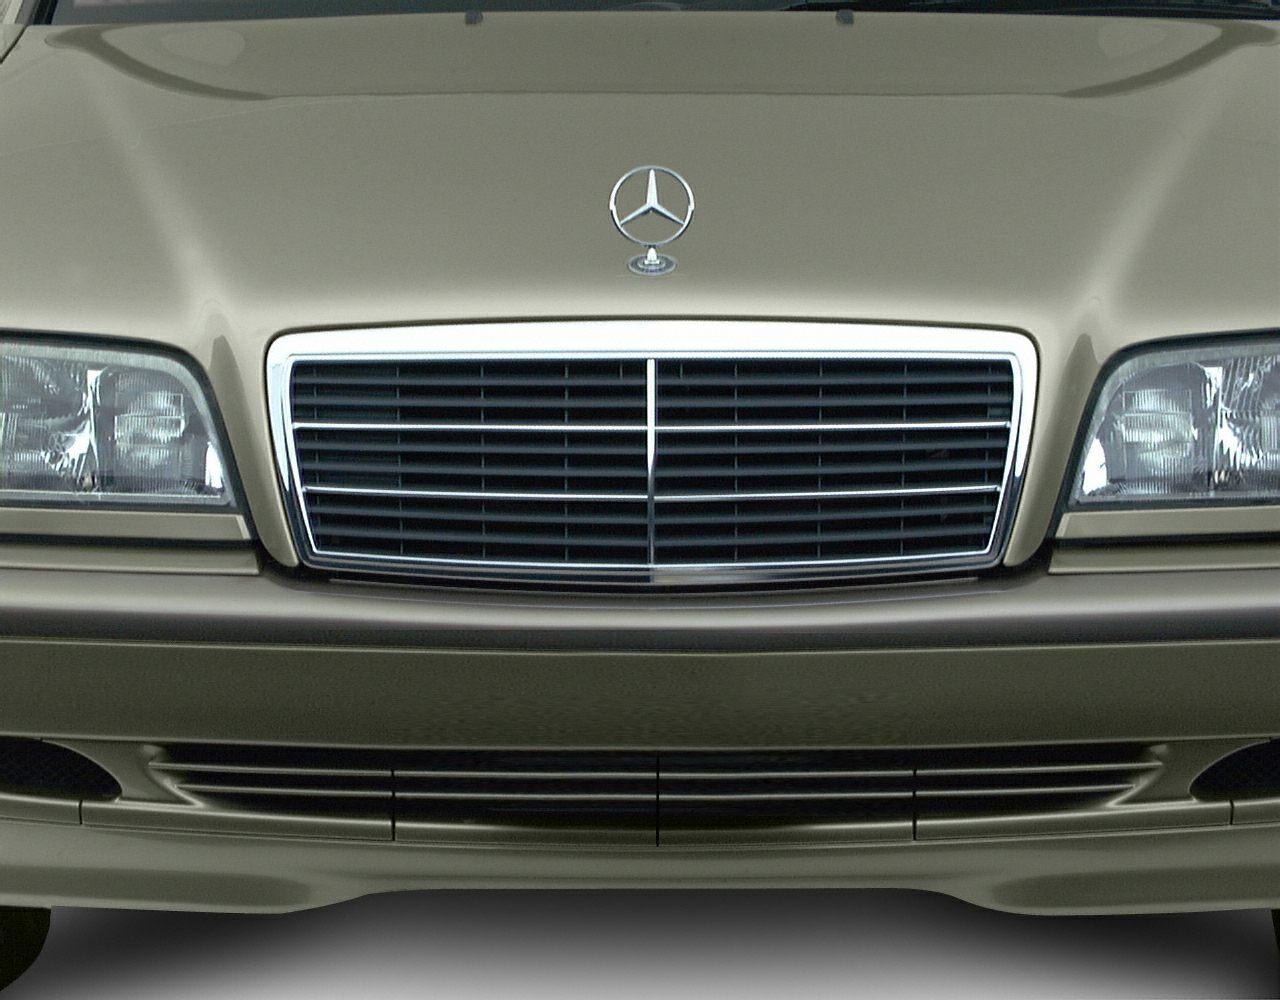 2000 mercedes benz c class kompressor c230 4dr sedan pictures. Black Bedroom Furniture Sets. Home Design Ideas